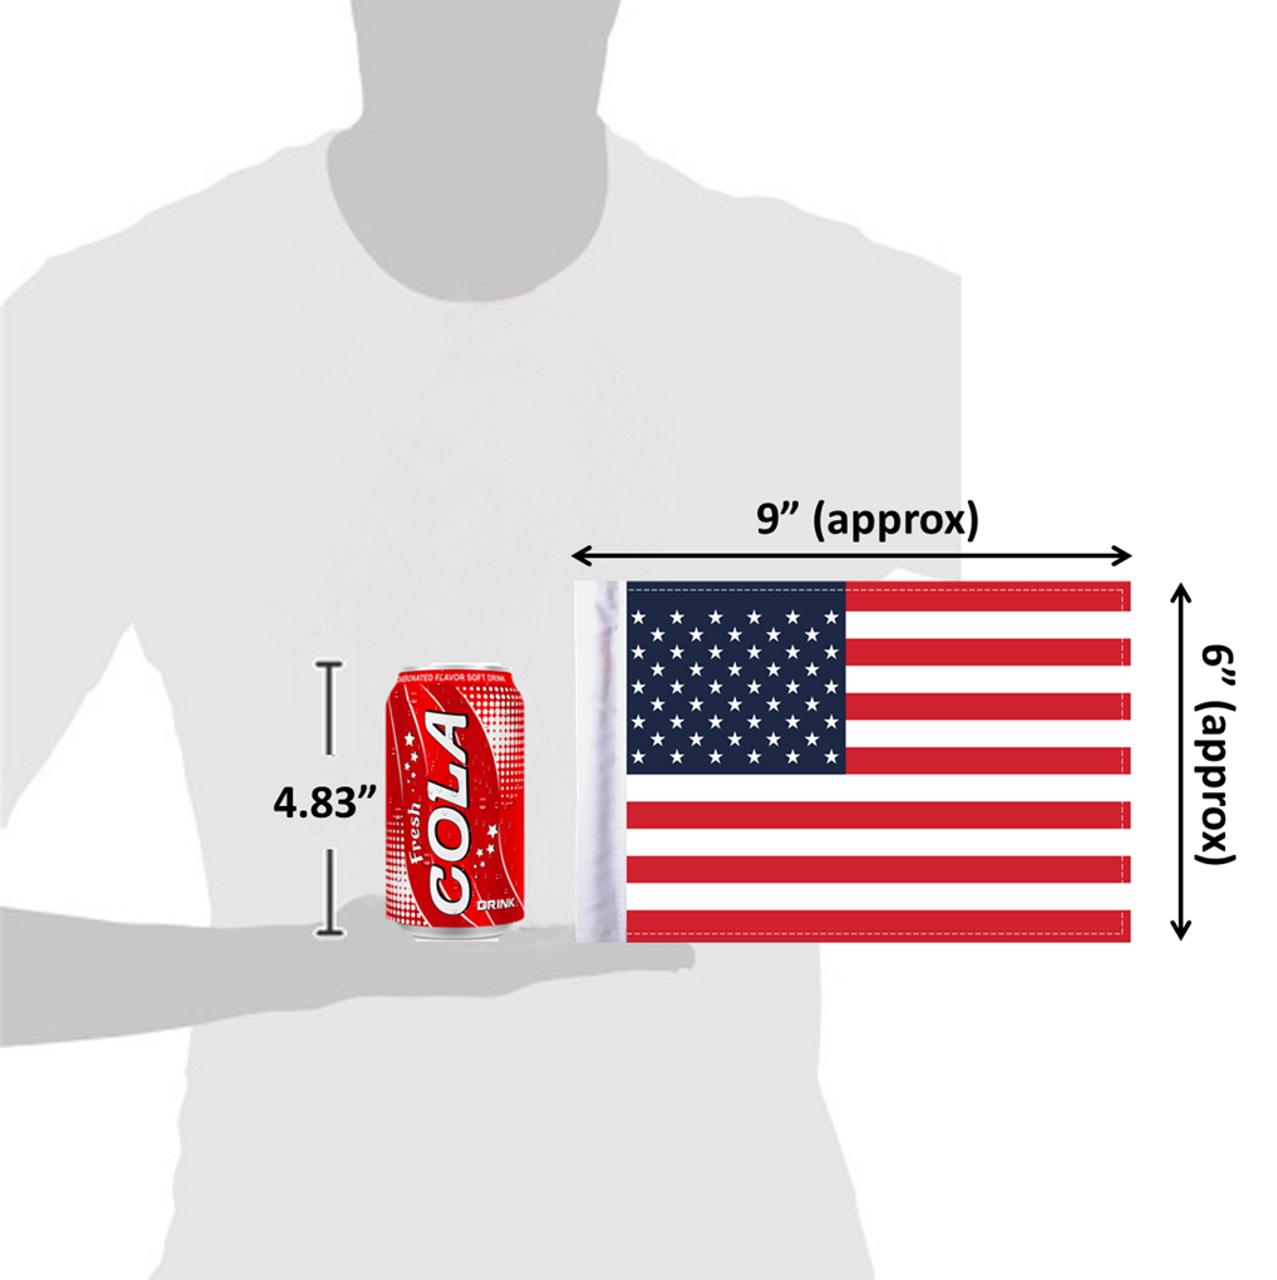 "6""x9"" United States of America (size comparison view)"